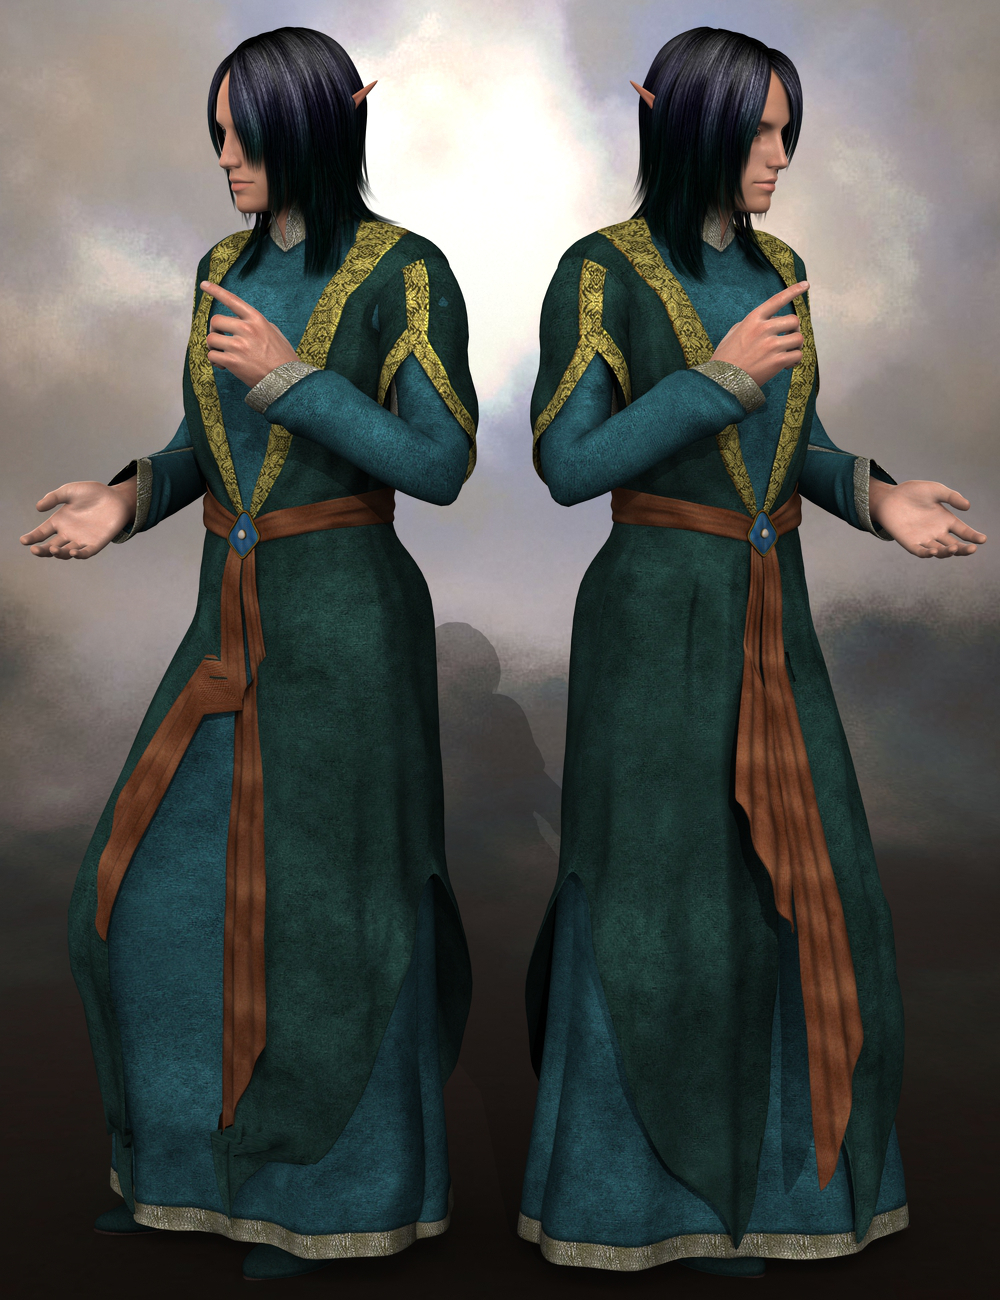 Sickle Tunic Rig Genesis 2 Male(s) by: Sickleyield, 3D Models by Daz 3D